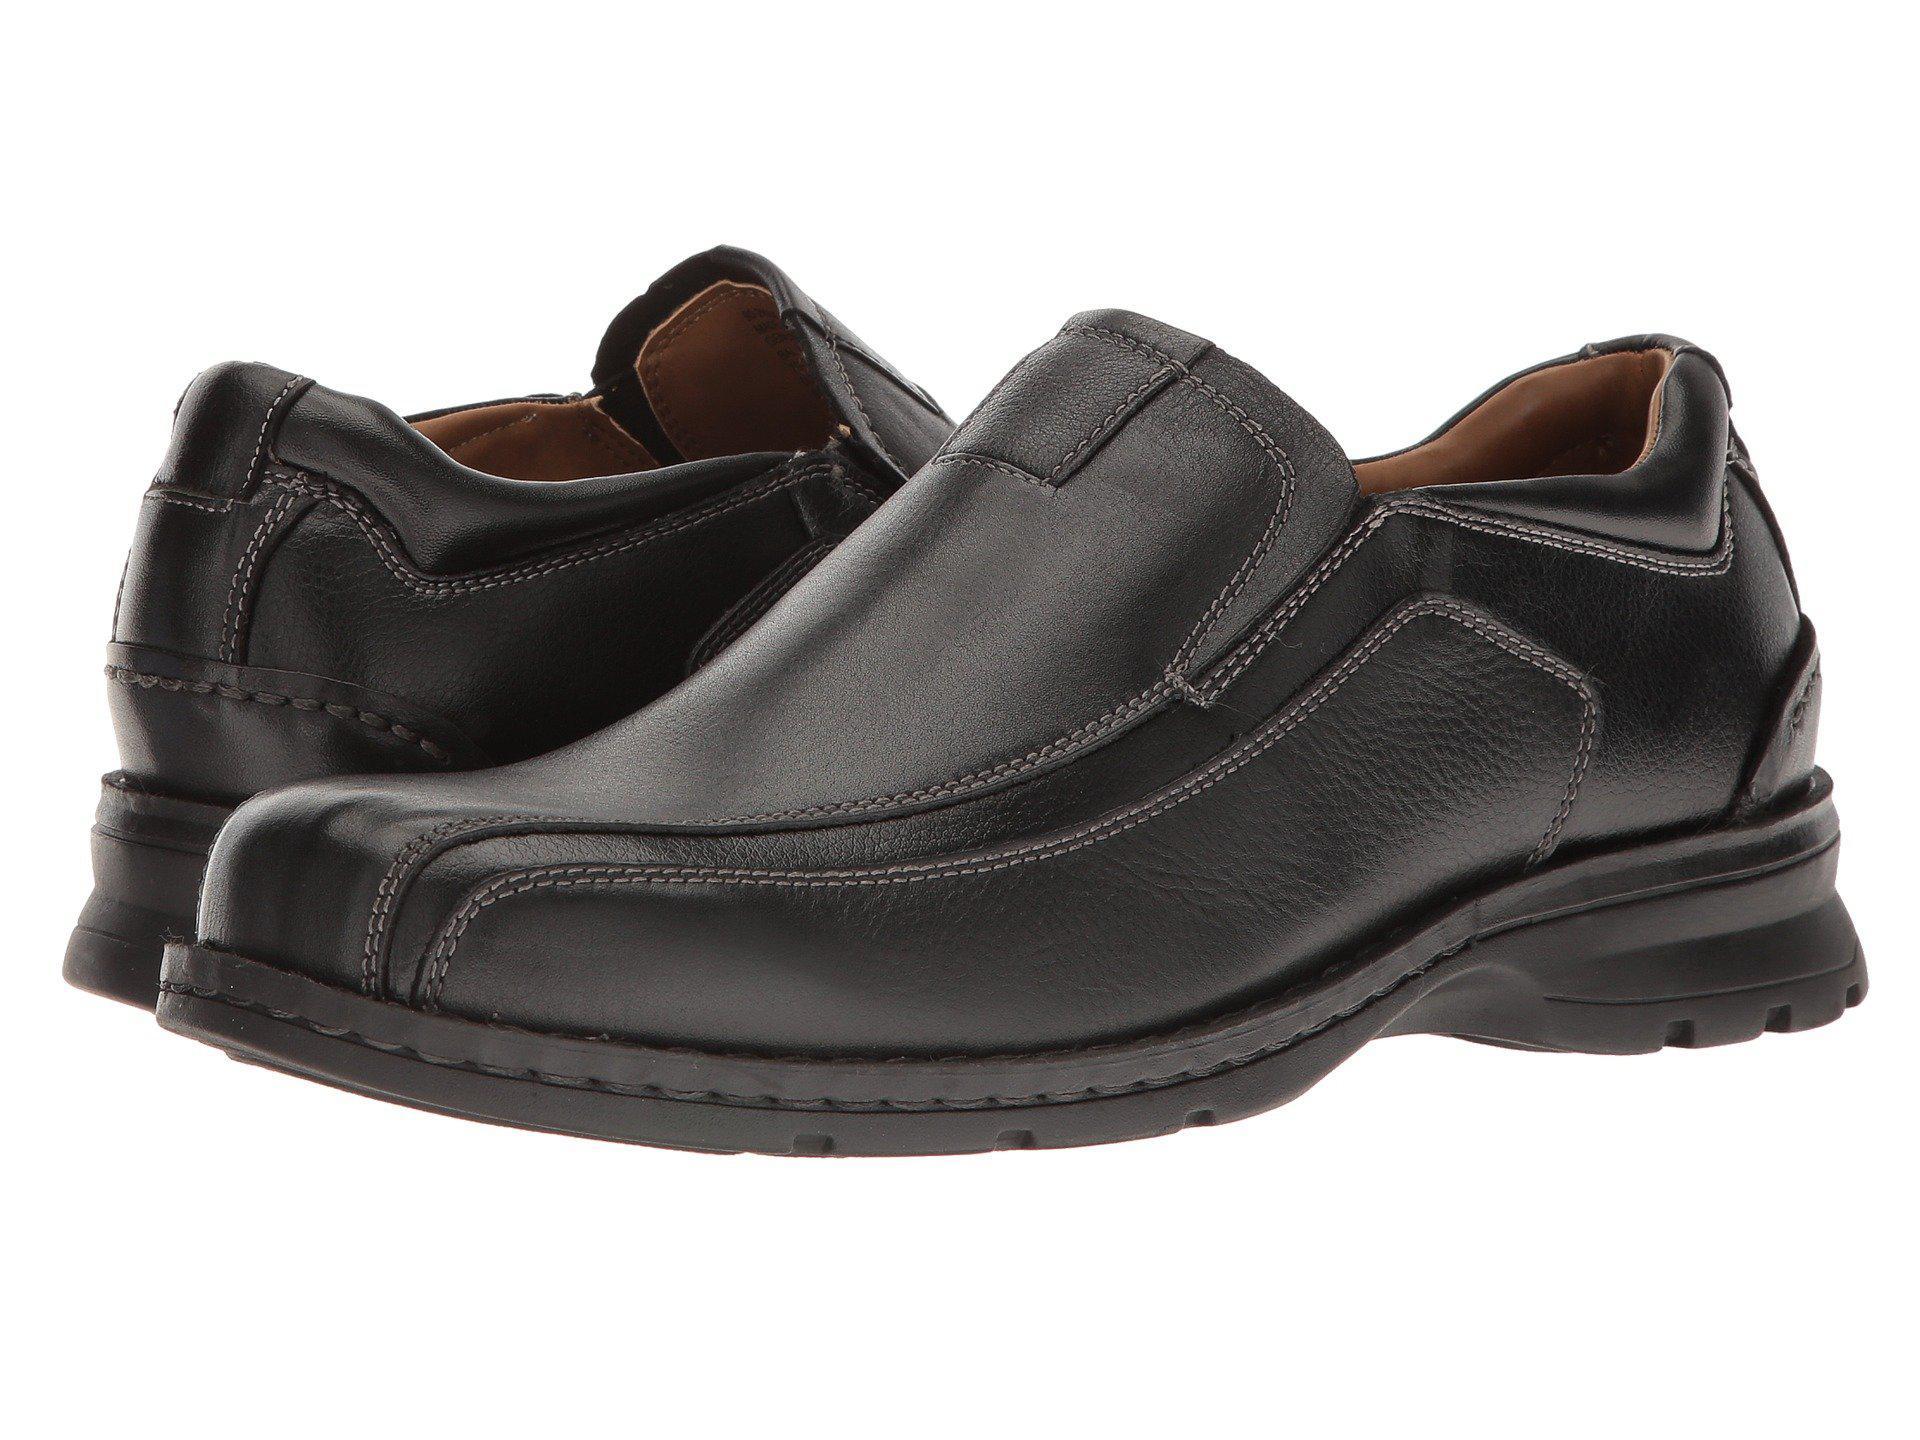 5e60d5957ba Lyst - Dockers Agent Bike Toe Slip On (black Tumbled Leather) Men s ...